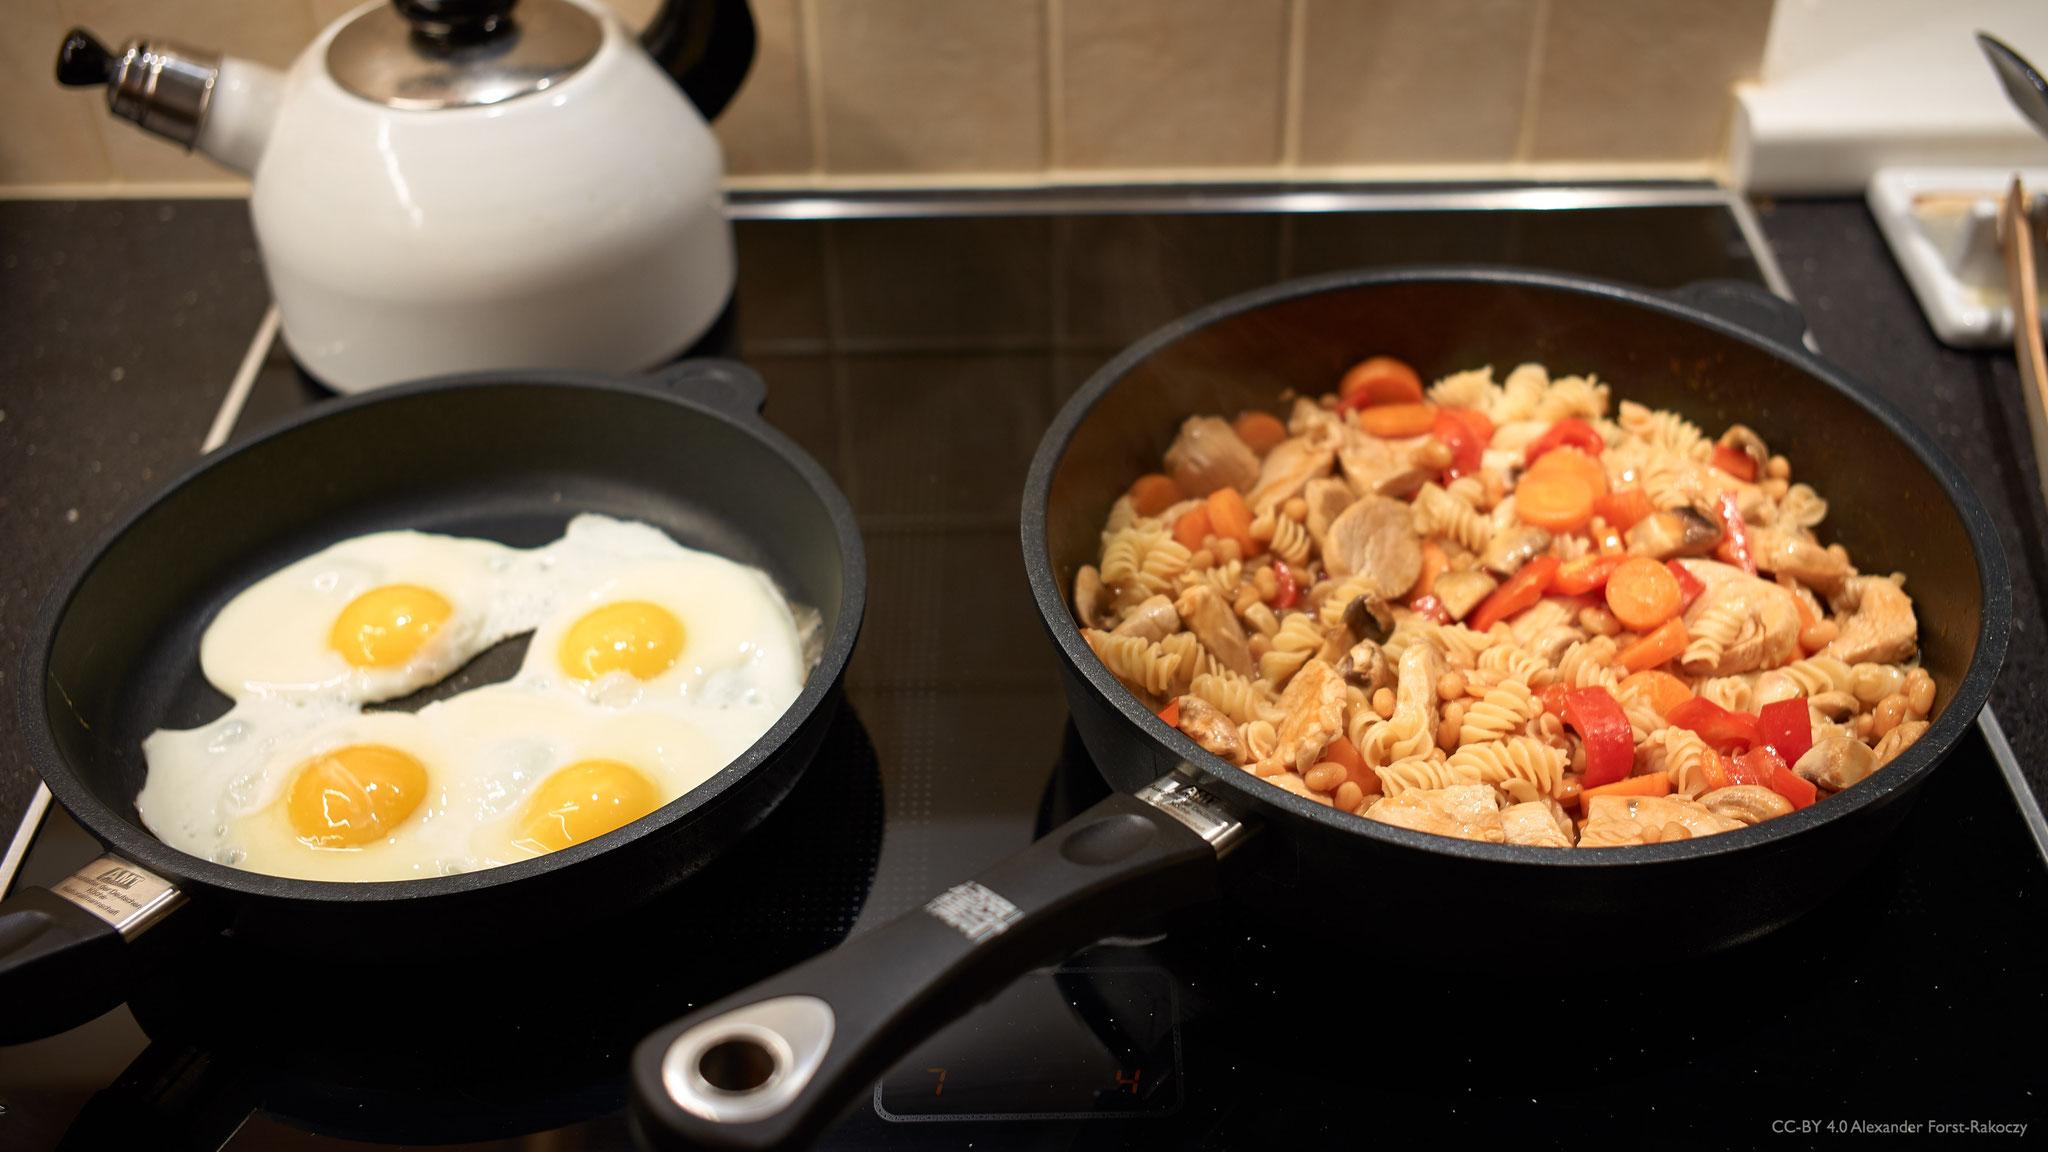 Alfora: Putenfleisch, Baked Beans, Karotten, Paprika, Champignons, Spiegeleier. Mahlzeit!